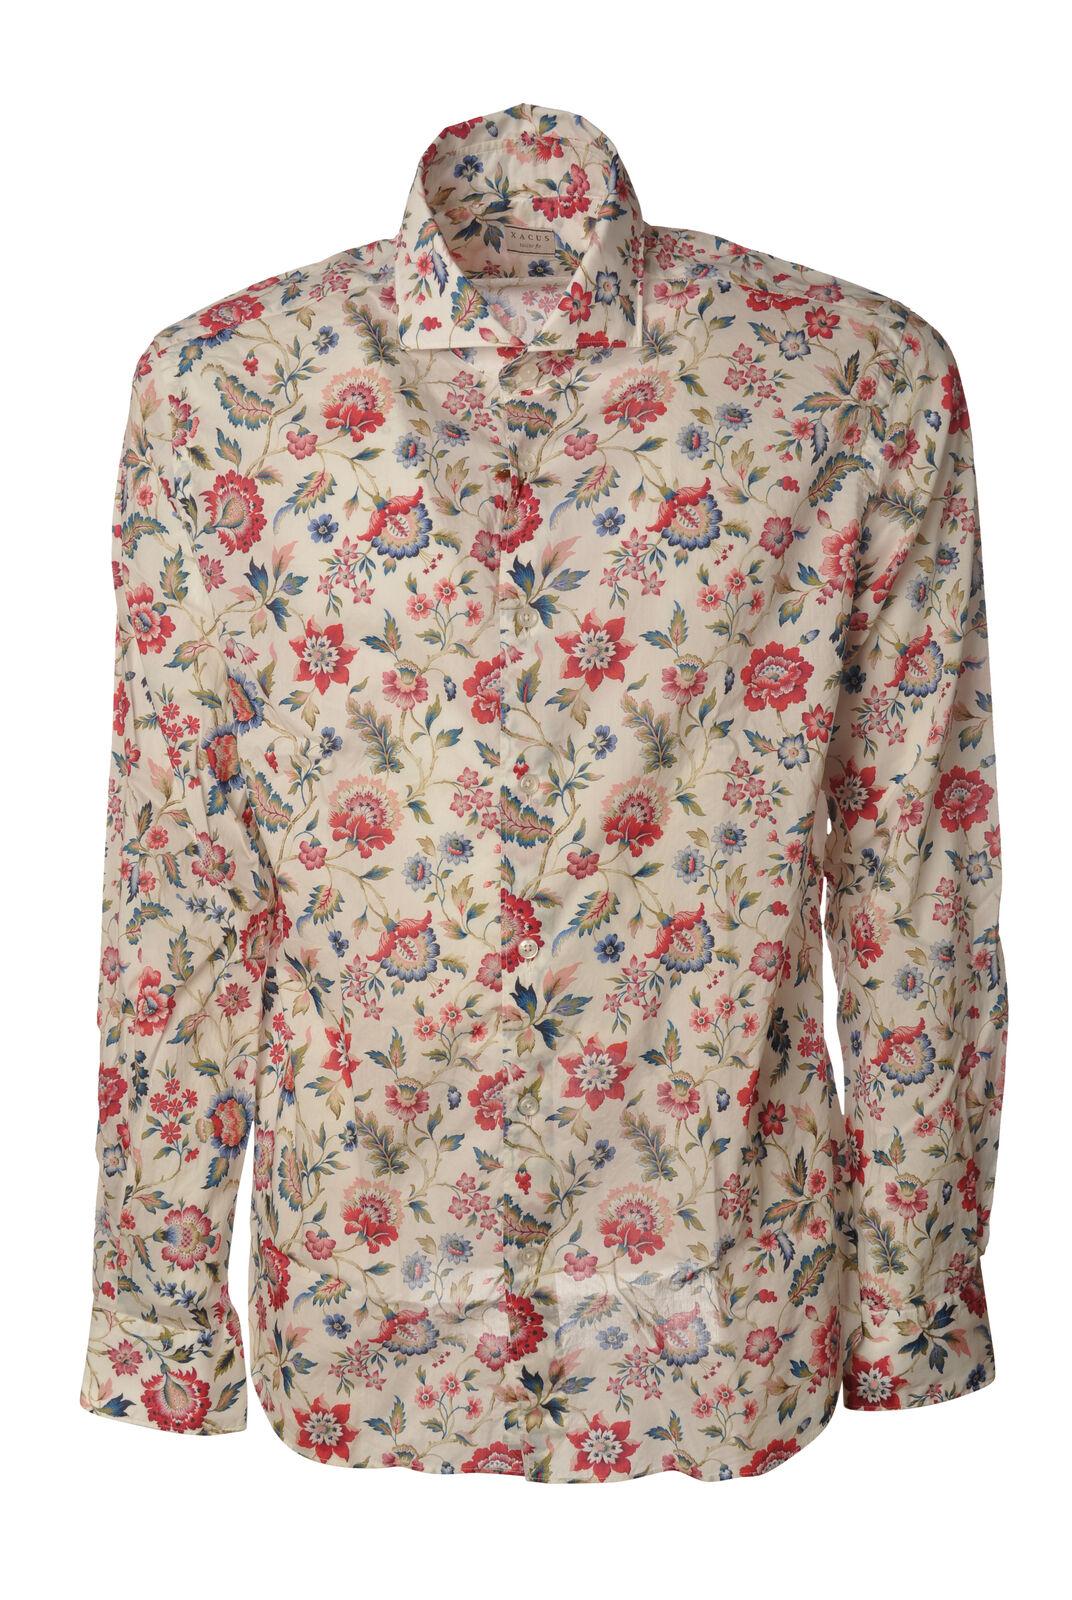 Xacus - Shirts-Shirts neck france - Woman - Fantasy - 6060018C191412